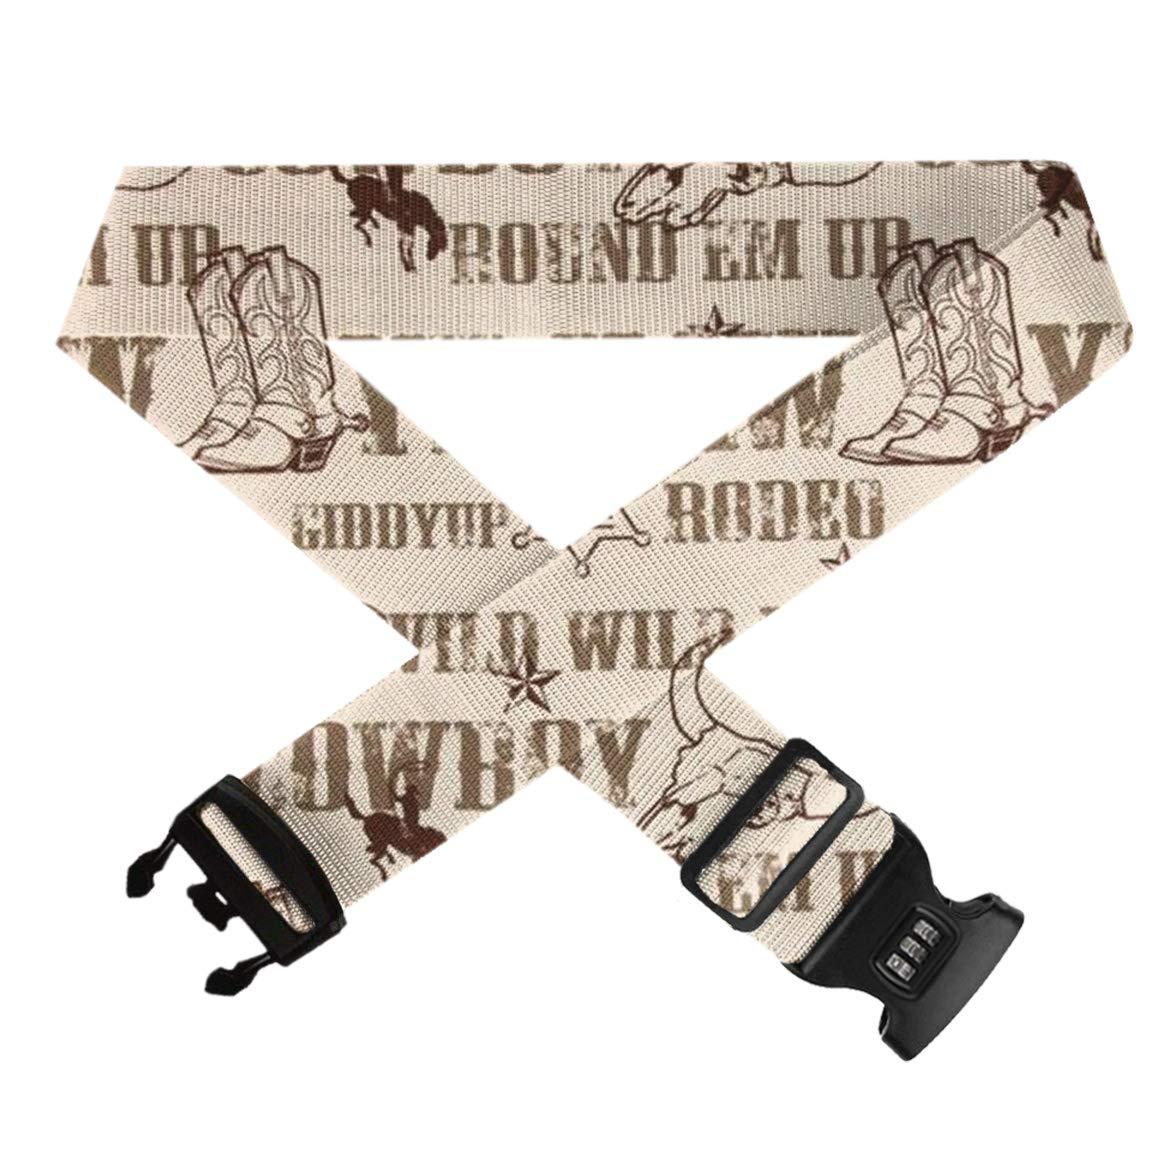 Adjustable Length Elastic Baggage Suitcase Straps Belts Premium Neoprene Baggage Suitcase Straps Belts Travel Suitcase Belt With 3-Dial Lock Cowboy Culture